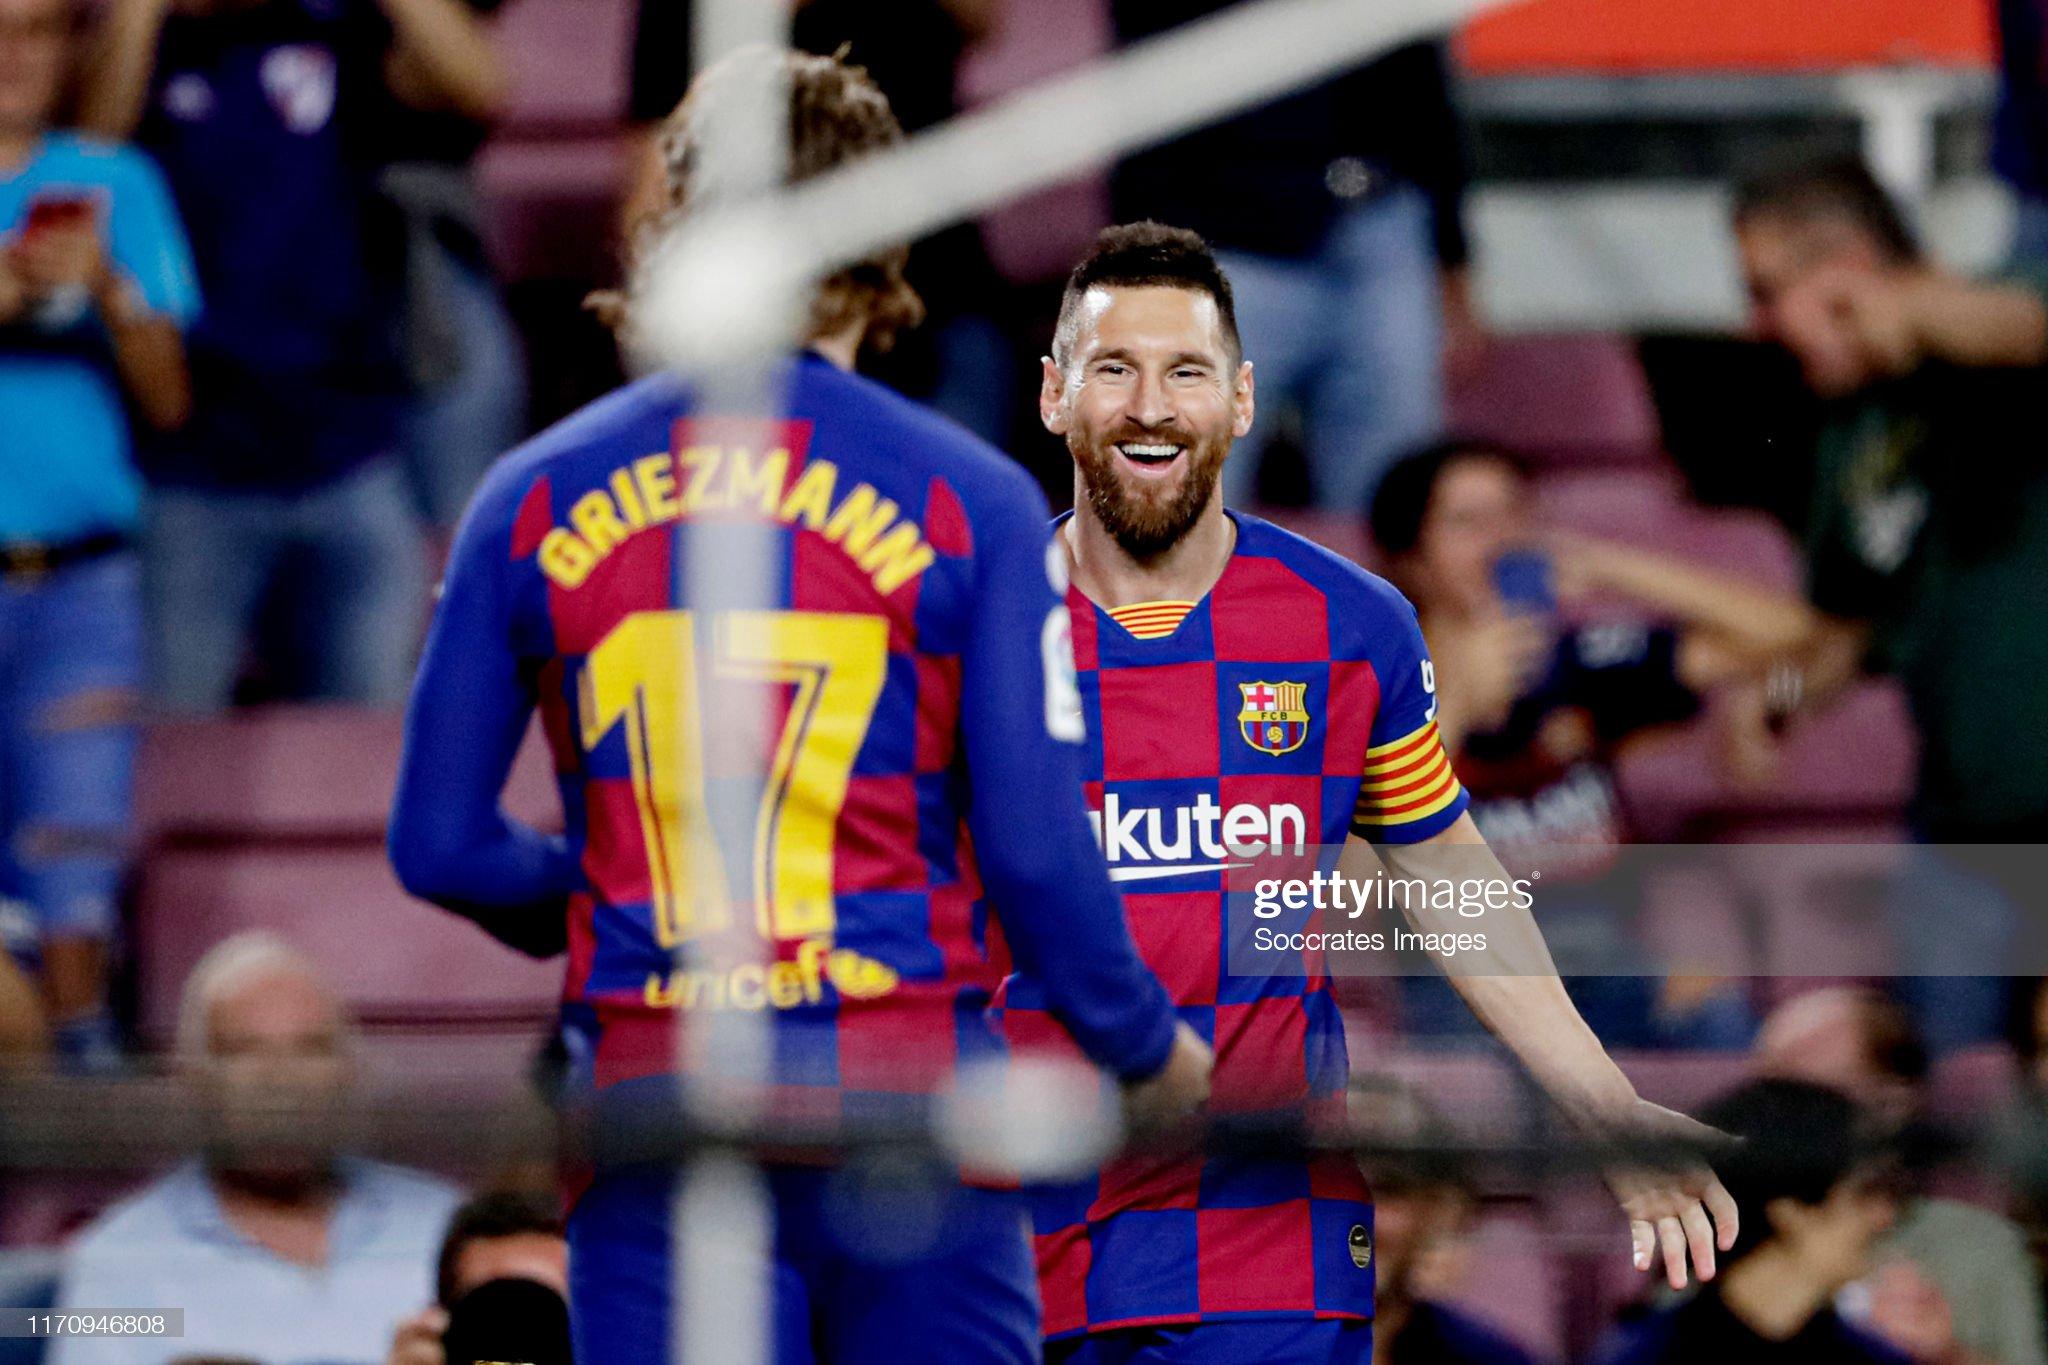 صور مباراة : برشلونة - فياريال 2-1 ( 24-09-2019 )  Antoine-griezmann-of-fc-barcelona-celebrates-10-with-lionel-messi-of-picture-id1170946808?s=2048x2048